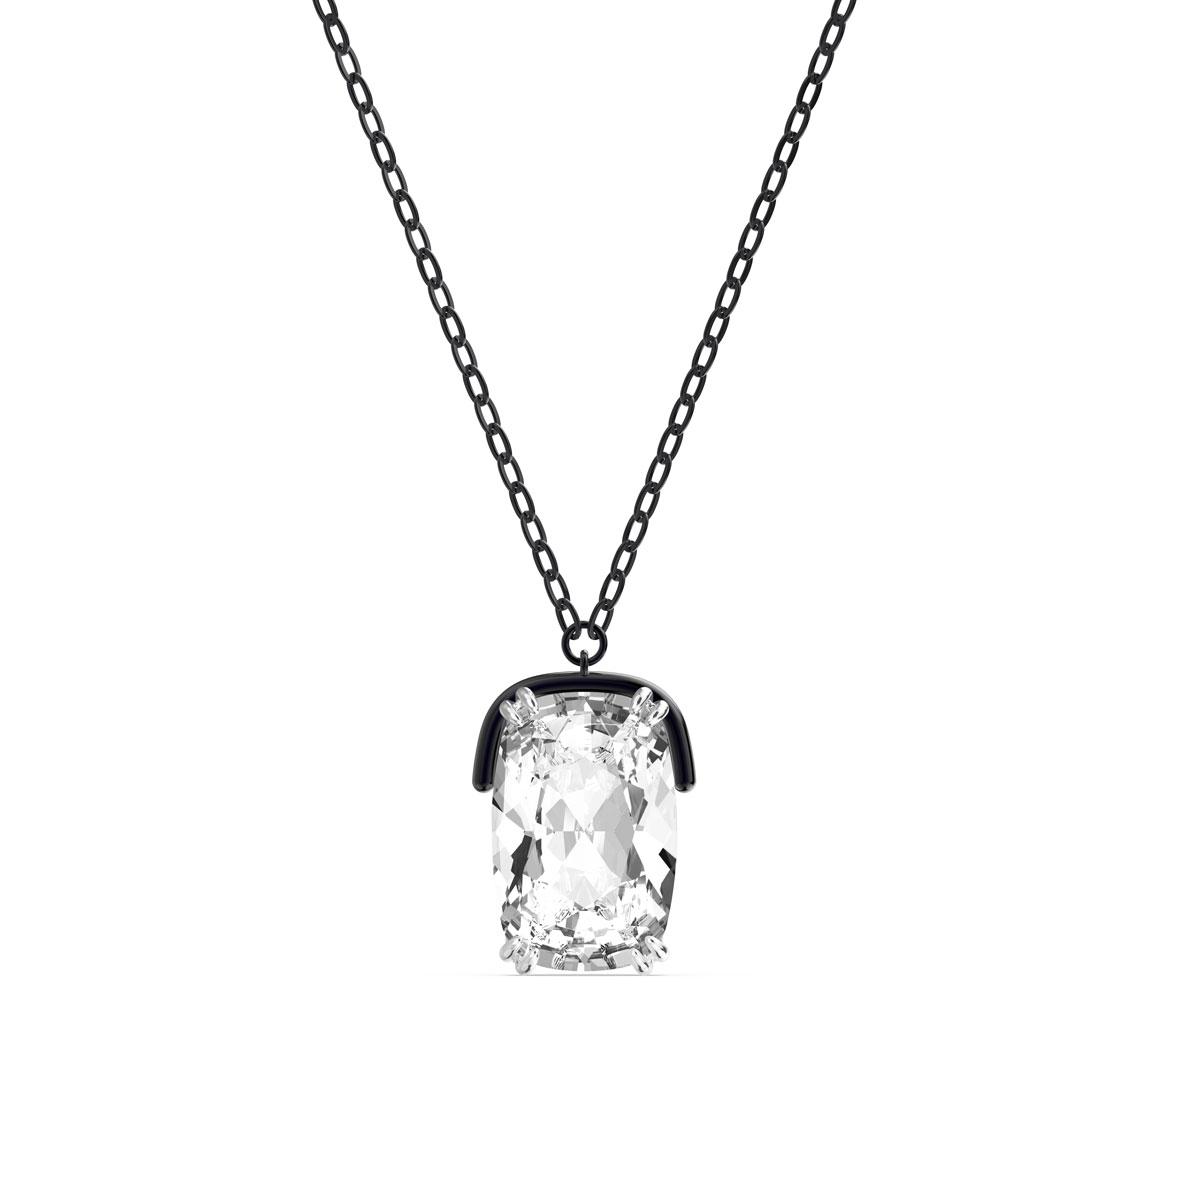 Swarovski Harmonia Pendant, Oversized Crystals, White, Mixed Metal Finish